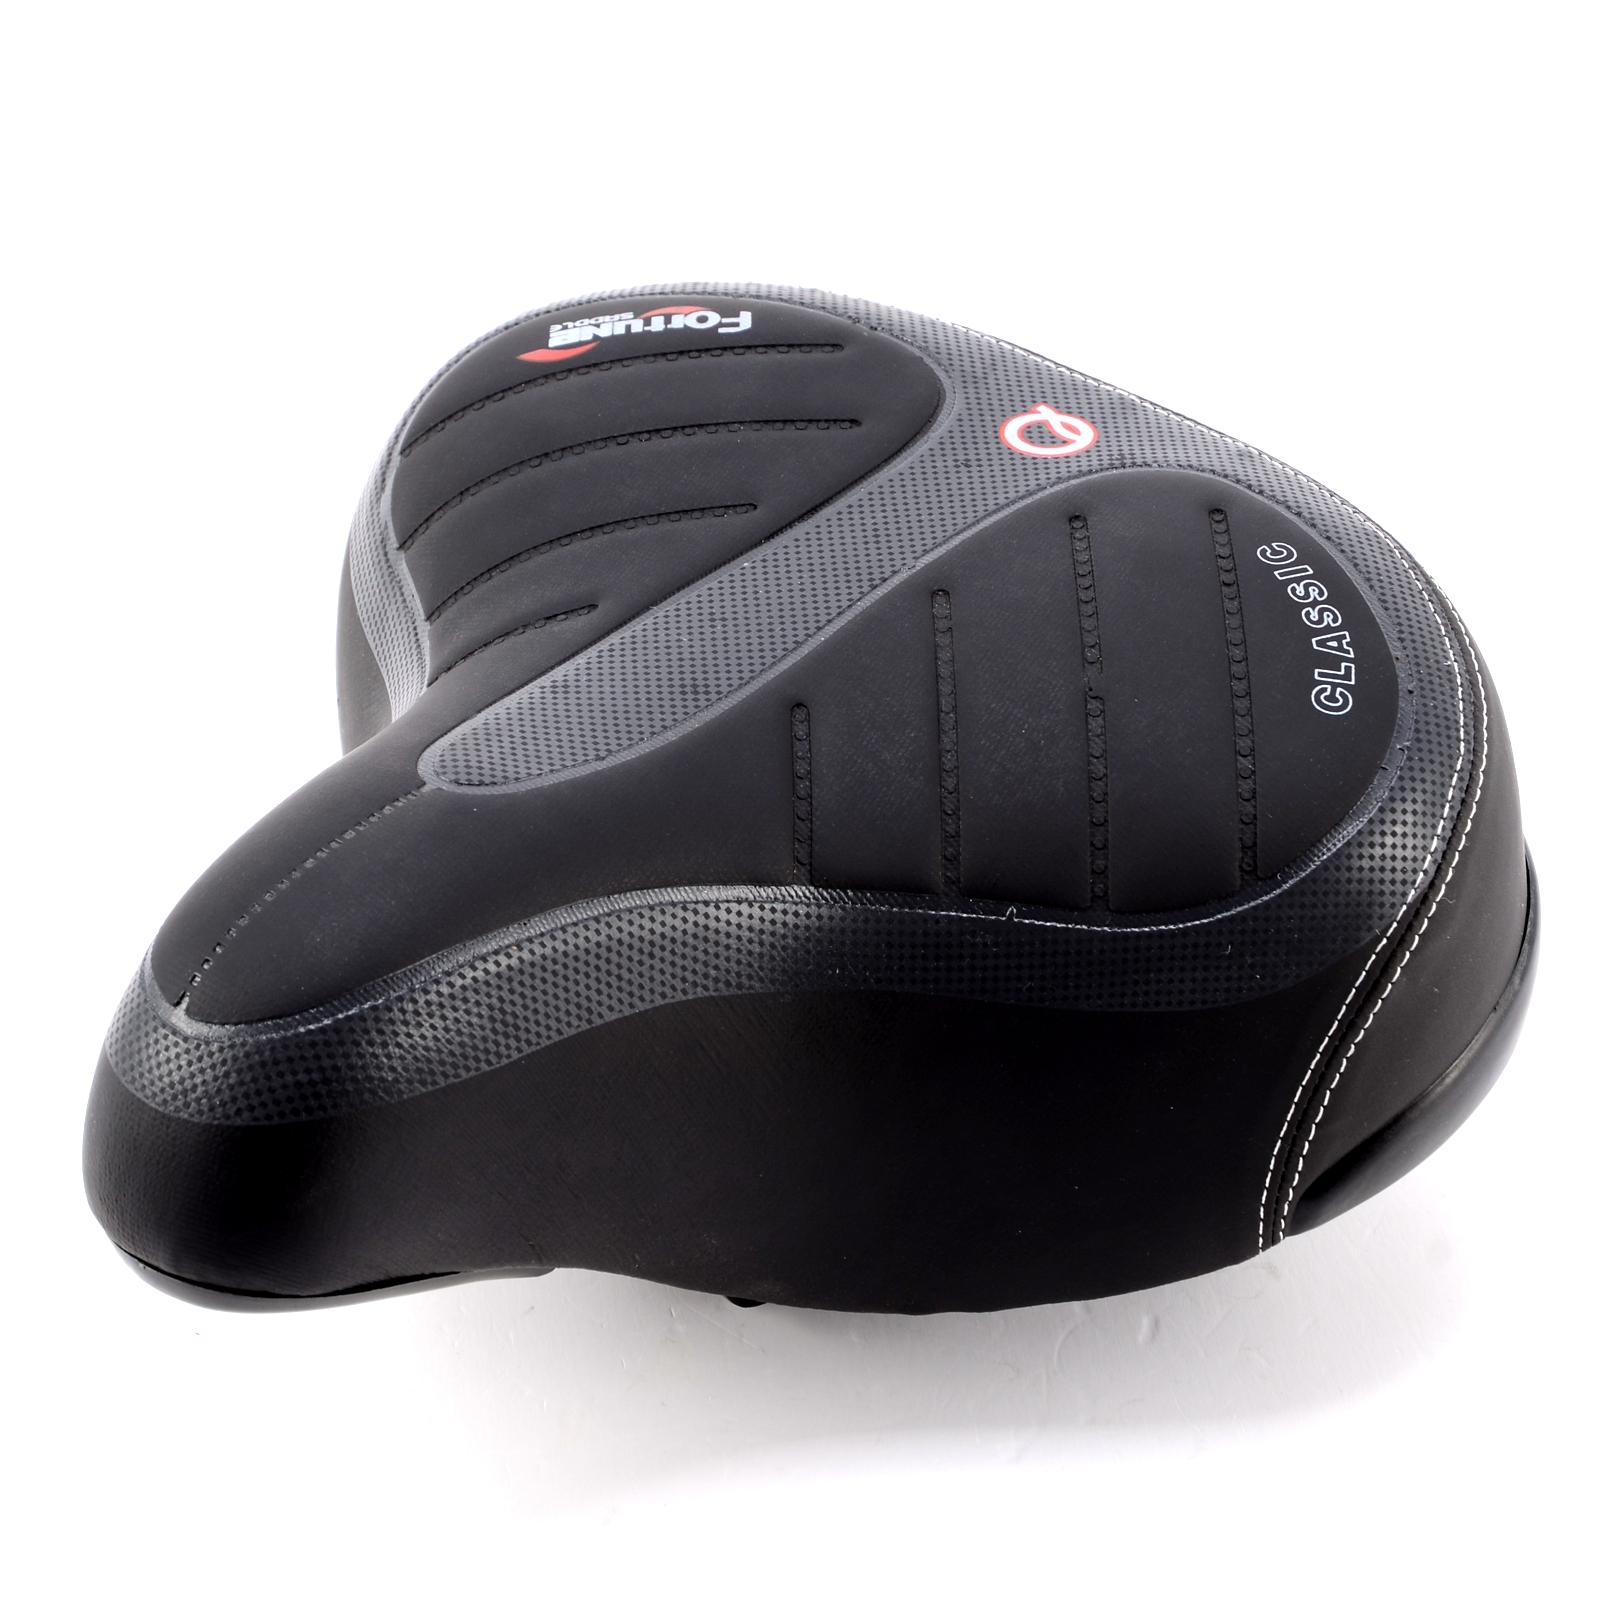 Extra Bike Seat : Wide big bum bicycle cycling road bike mountain seat